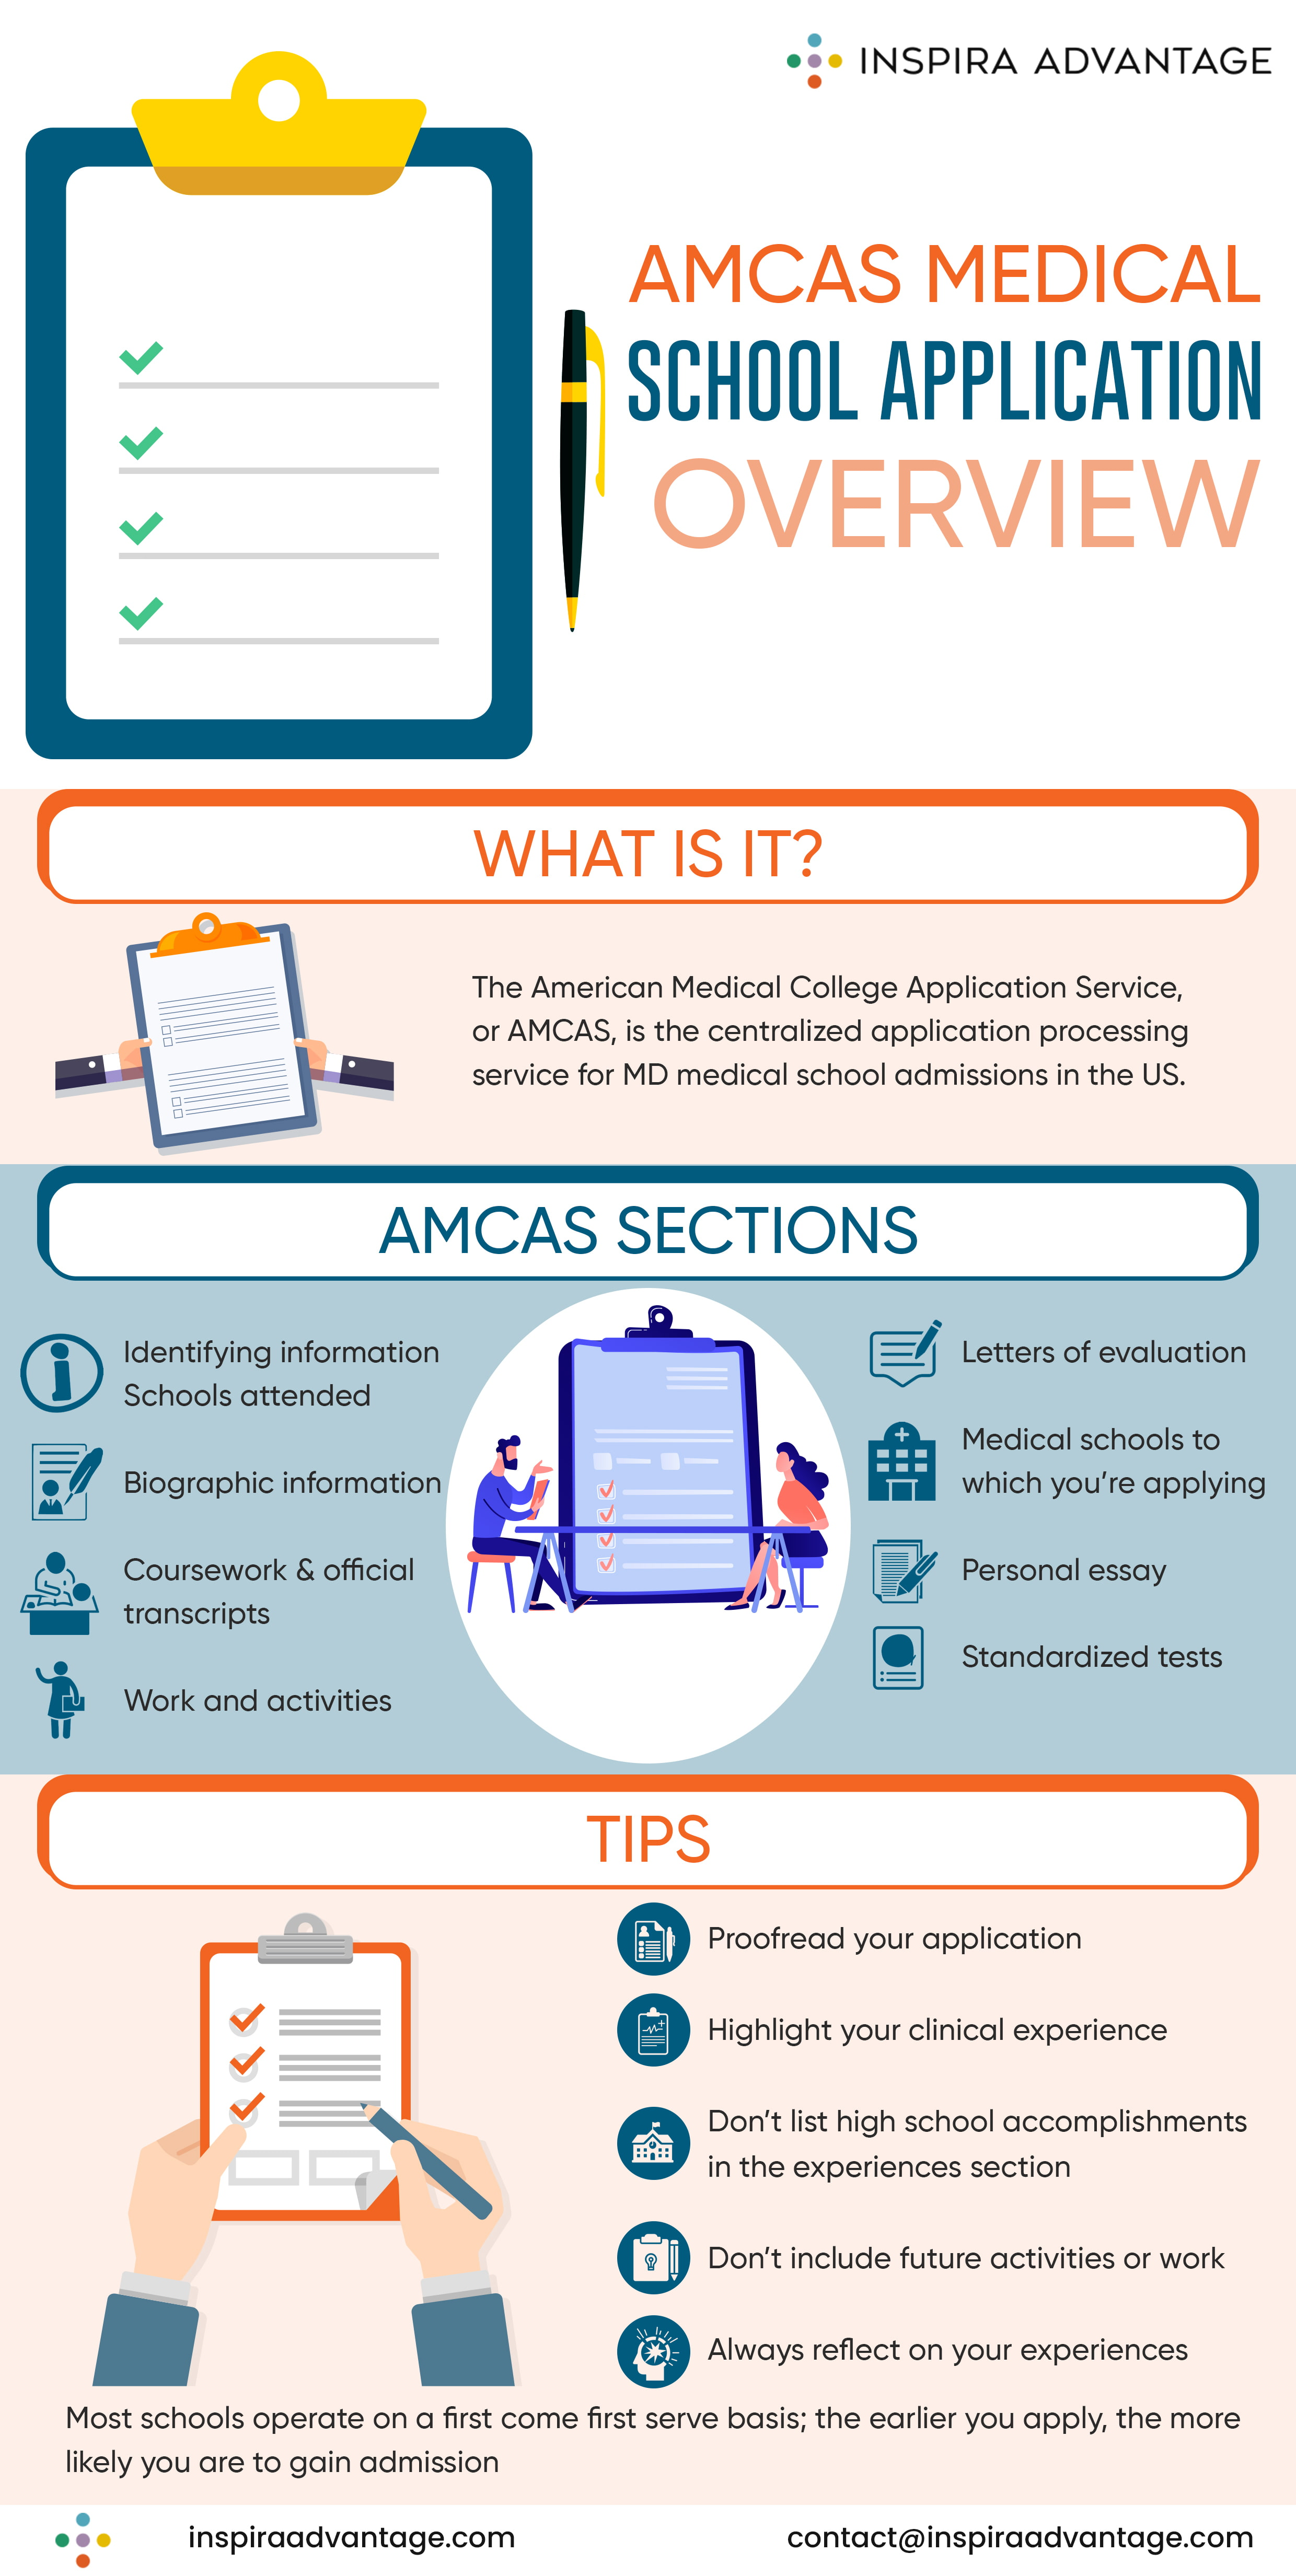 AMCAS medical school application overview